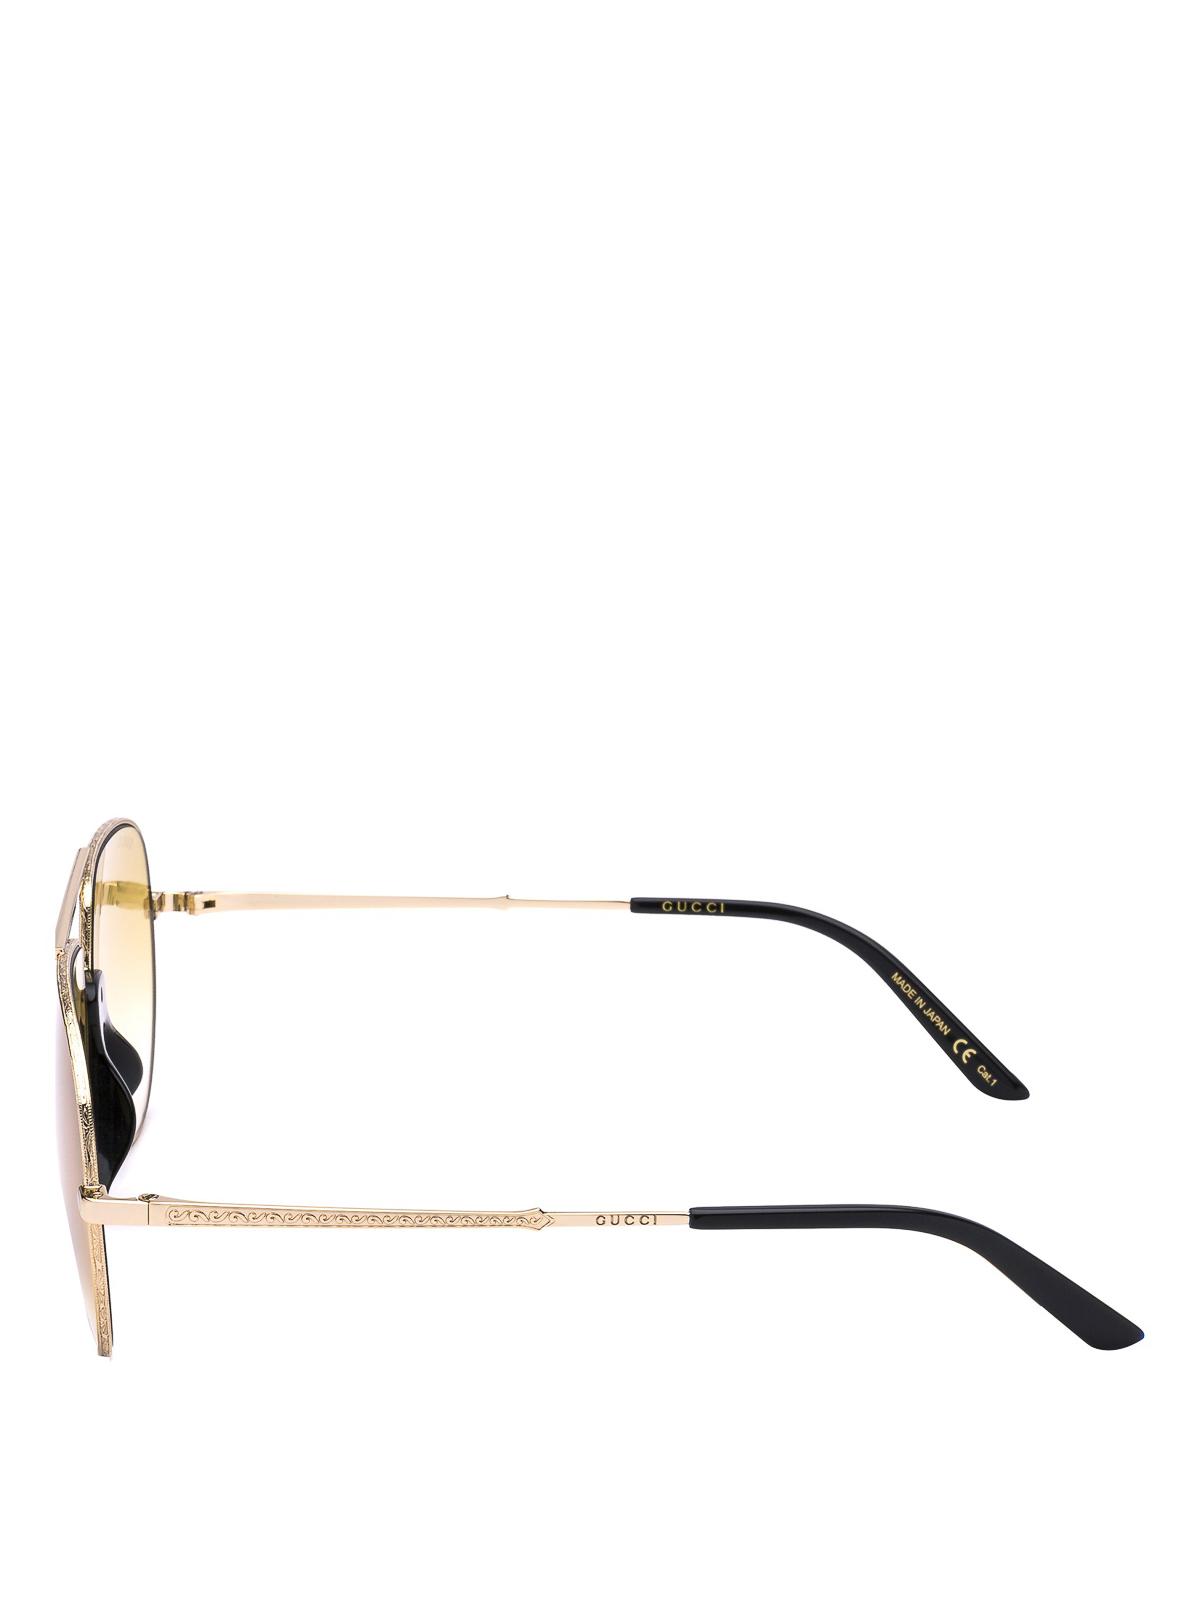 3f246fac68fc8 GUCCI  sunglasses online - Aviator sunglasses with black acetate details